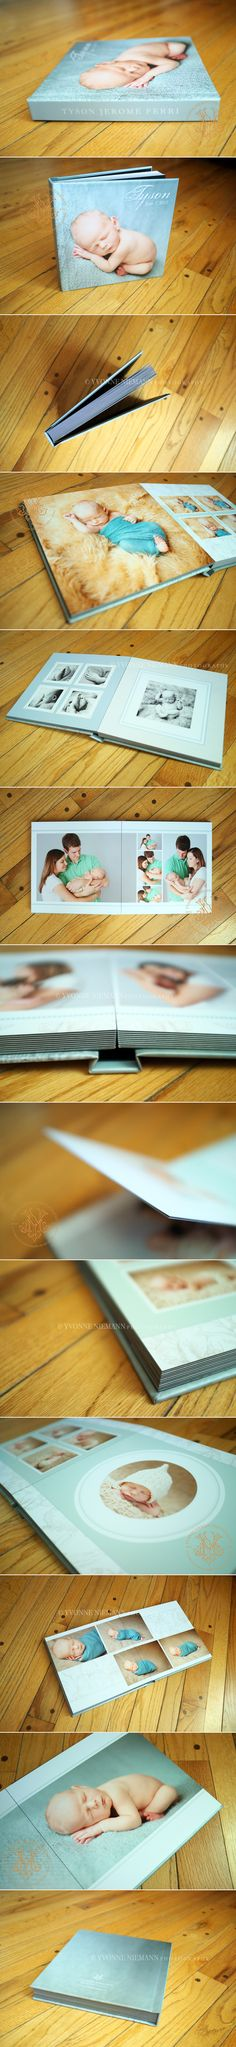 Newborn Storybook Album by Yvonne Niemann